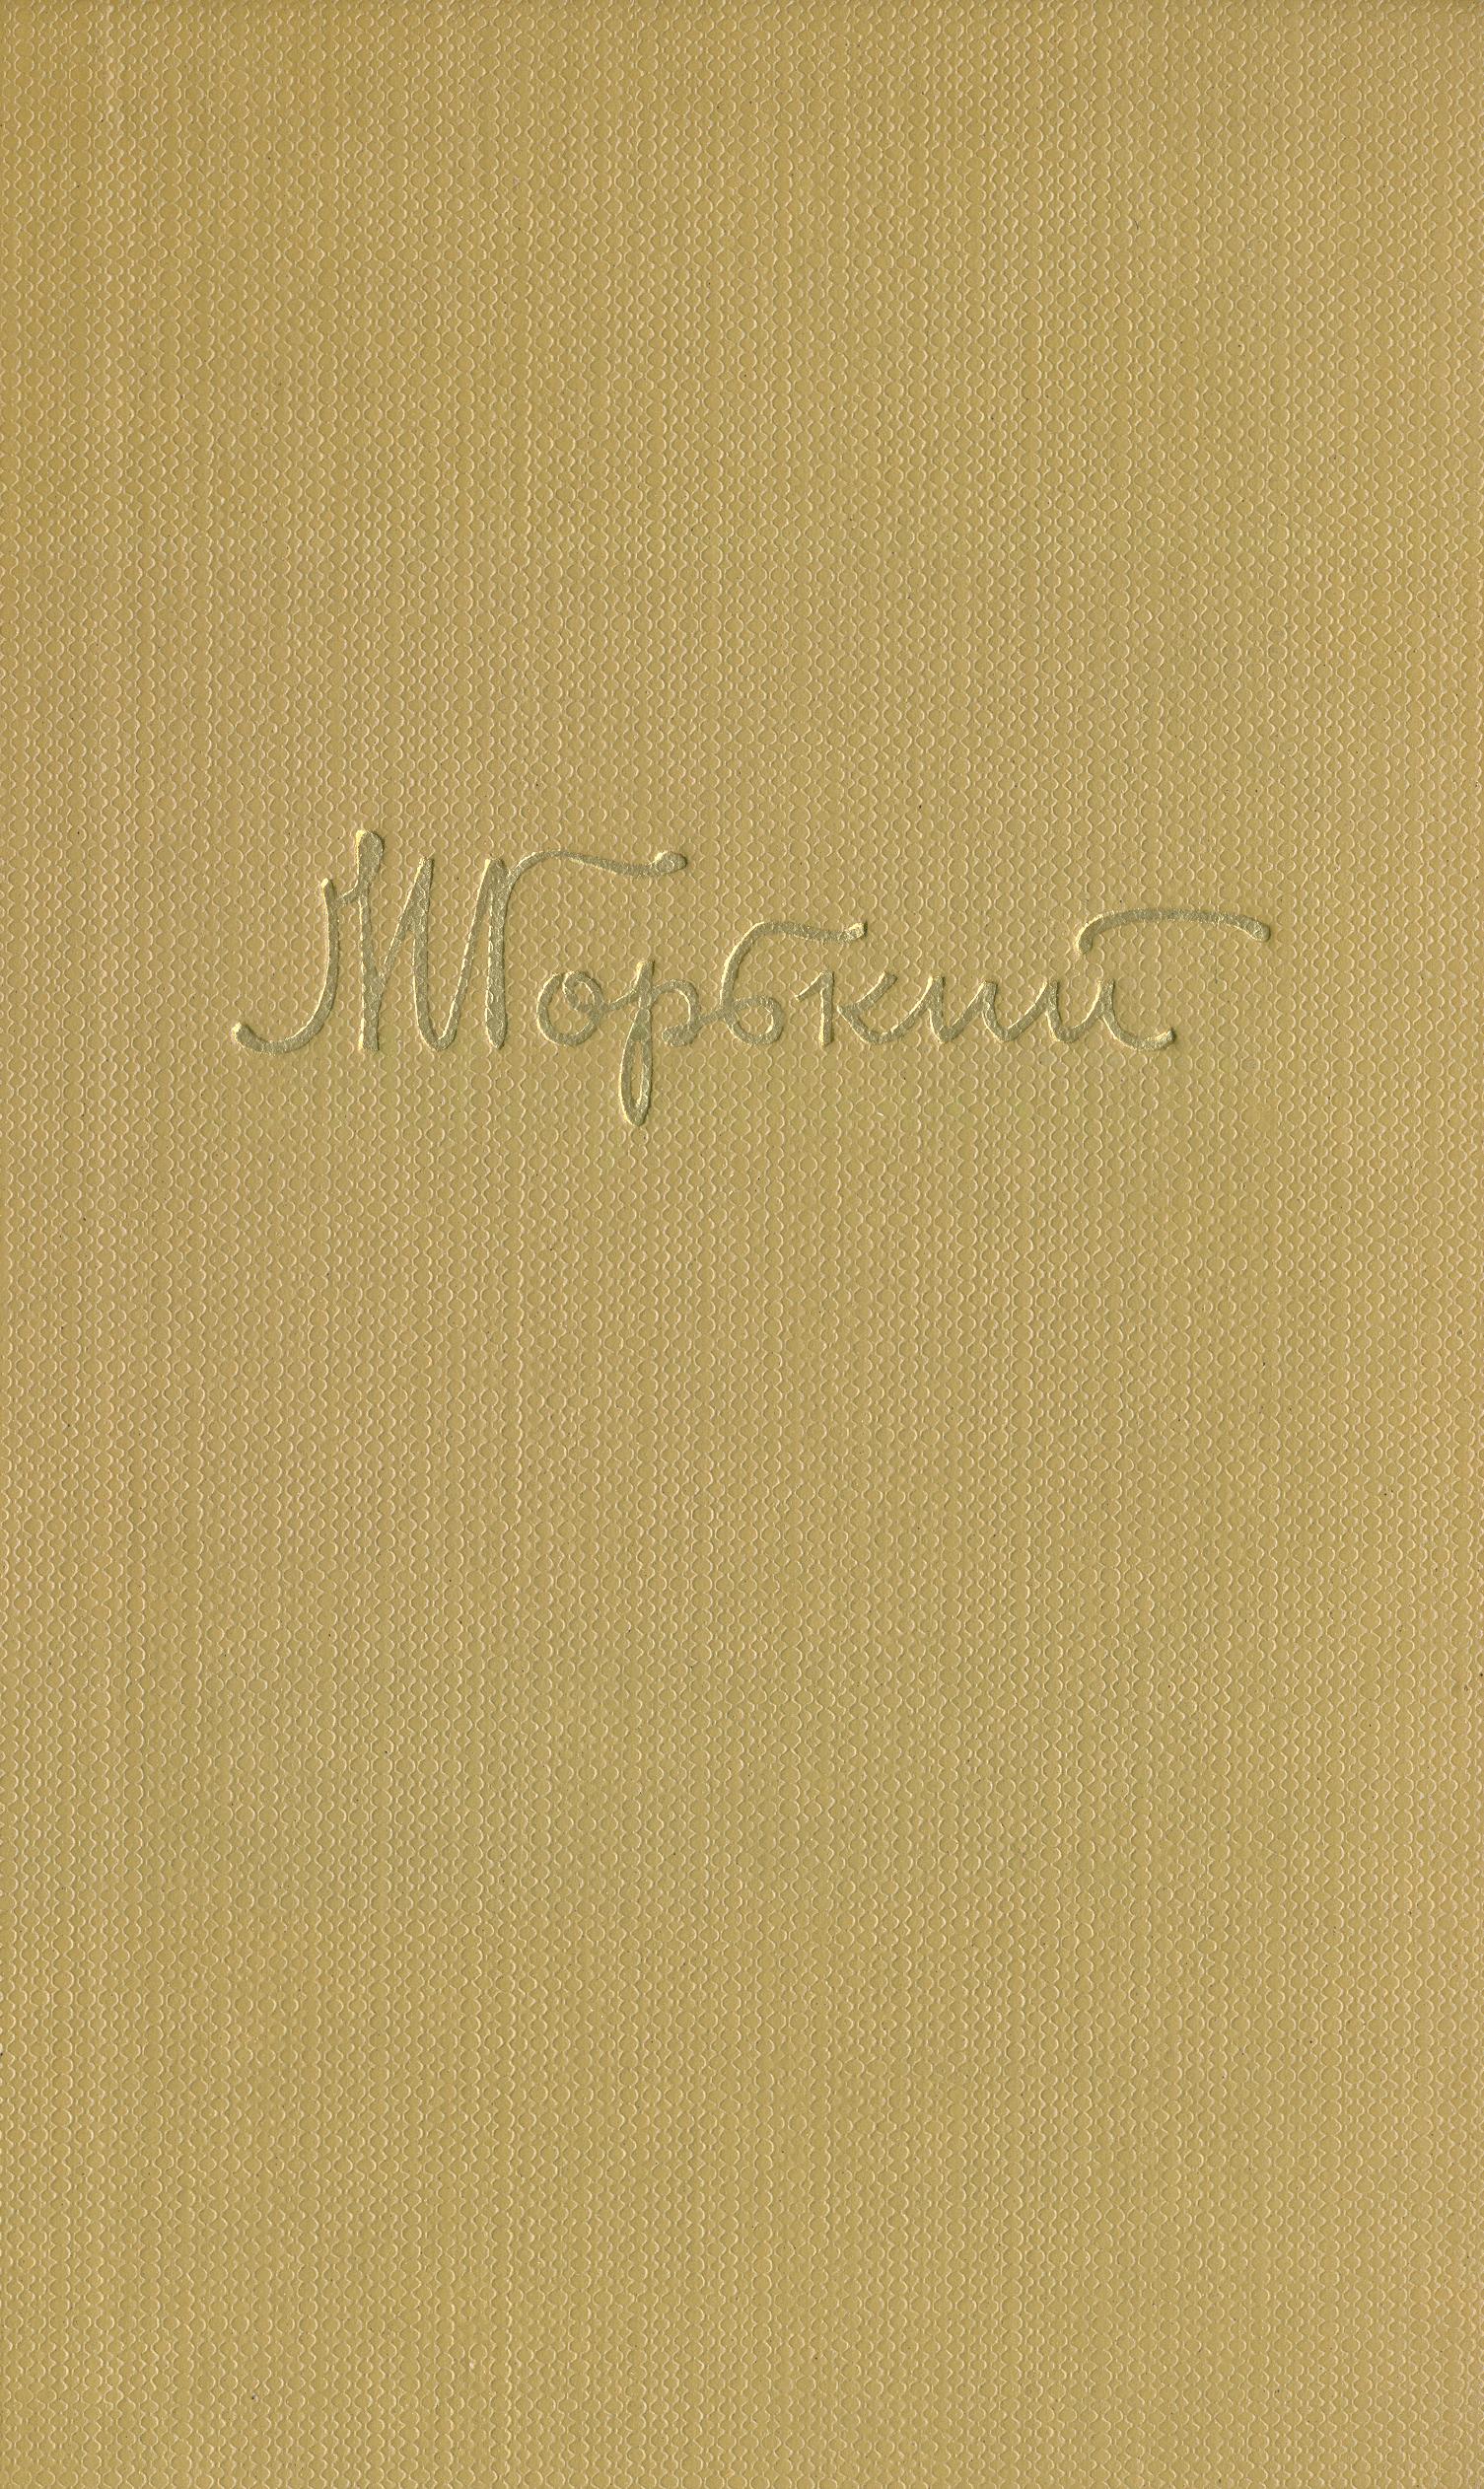 М. Горький М. Горький. Собрание сочинений в 18 томах. Том 7 цена